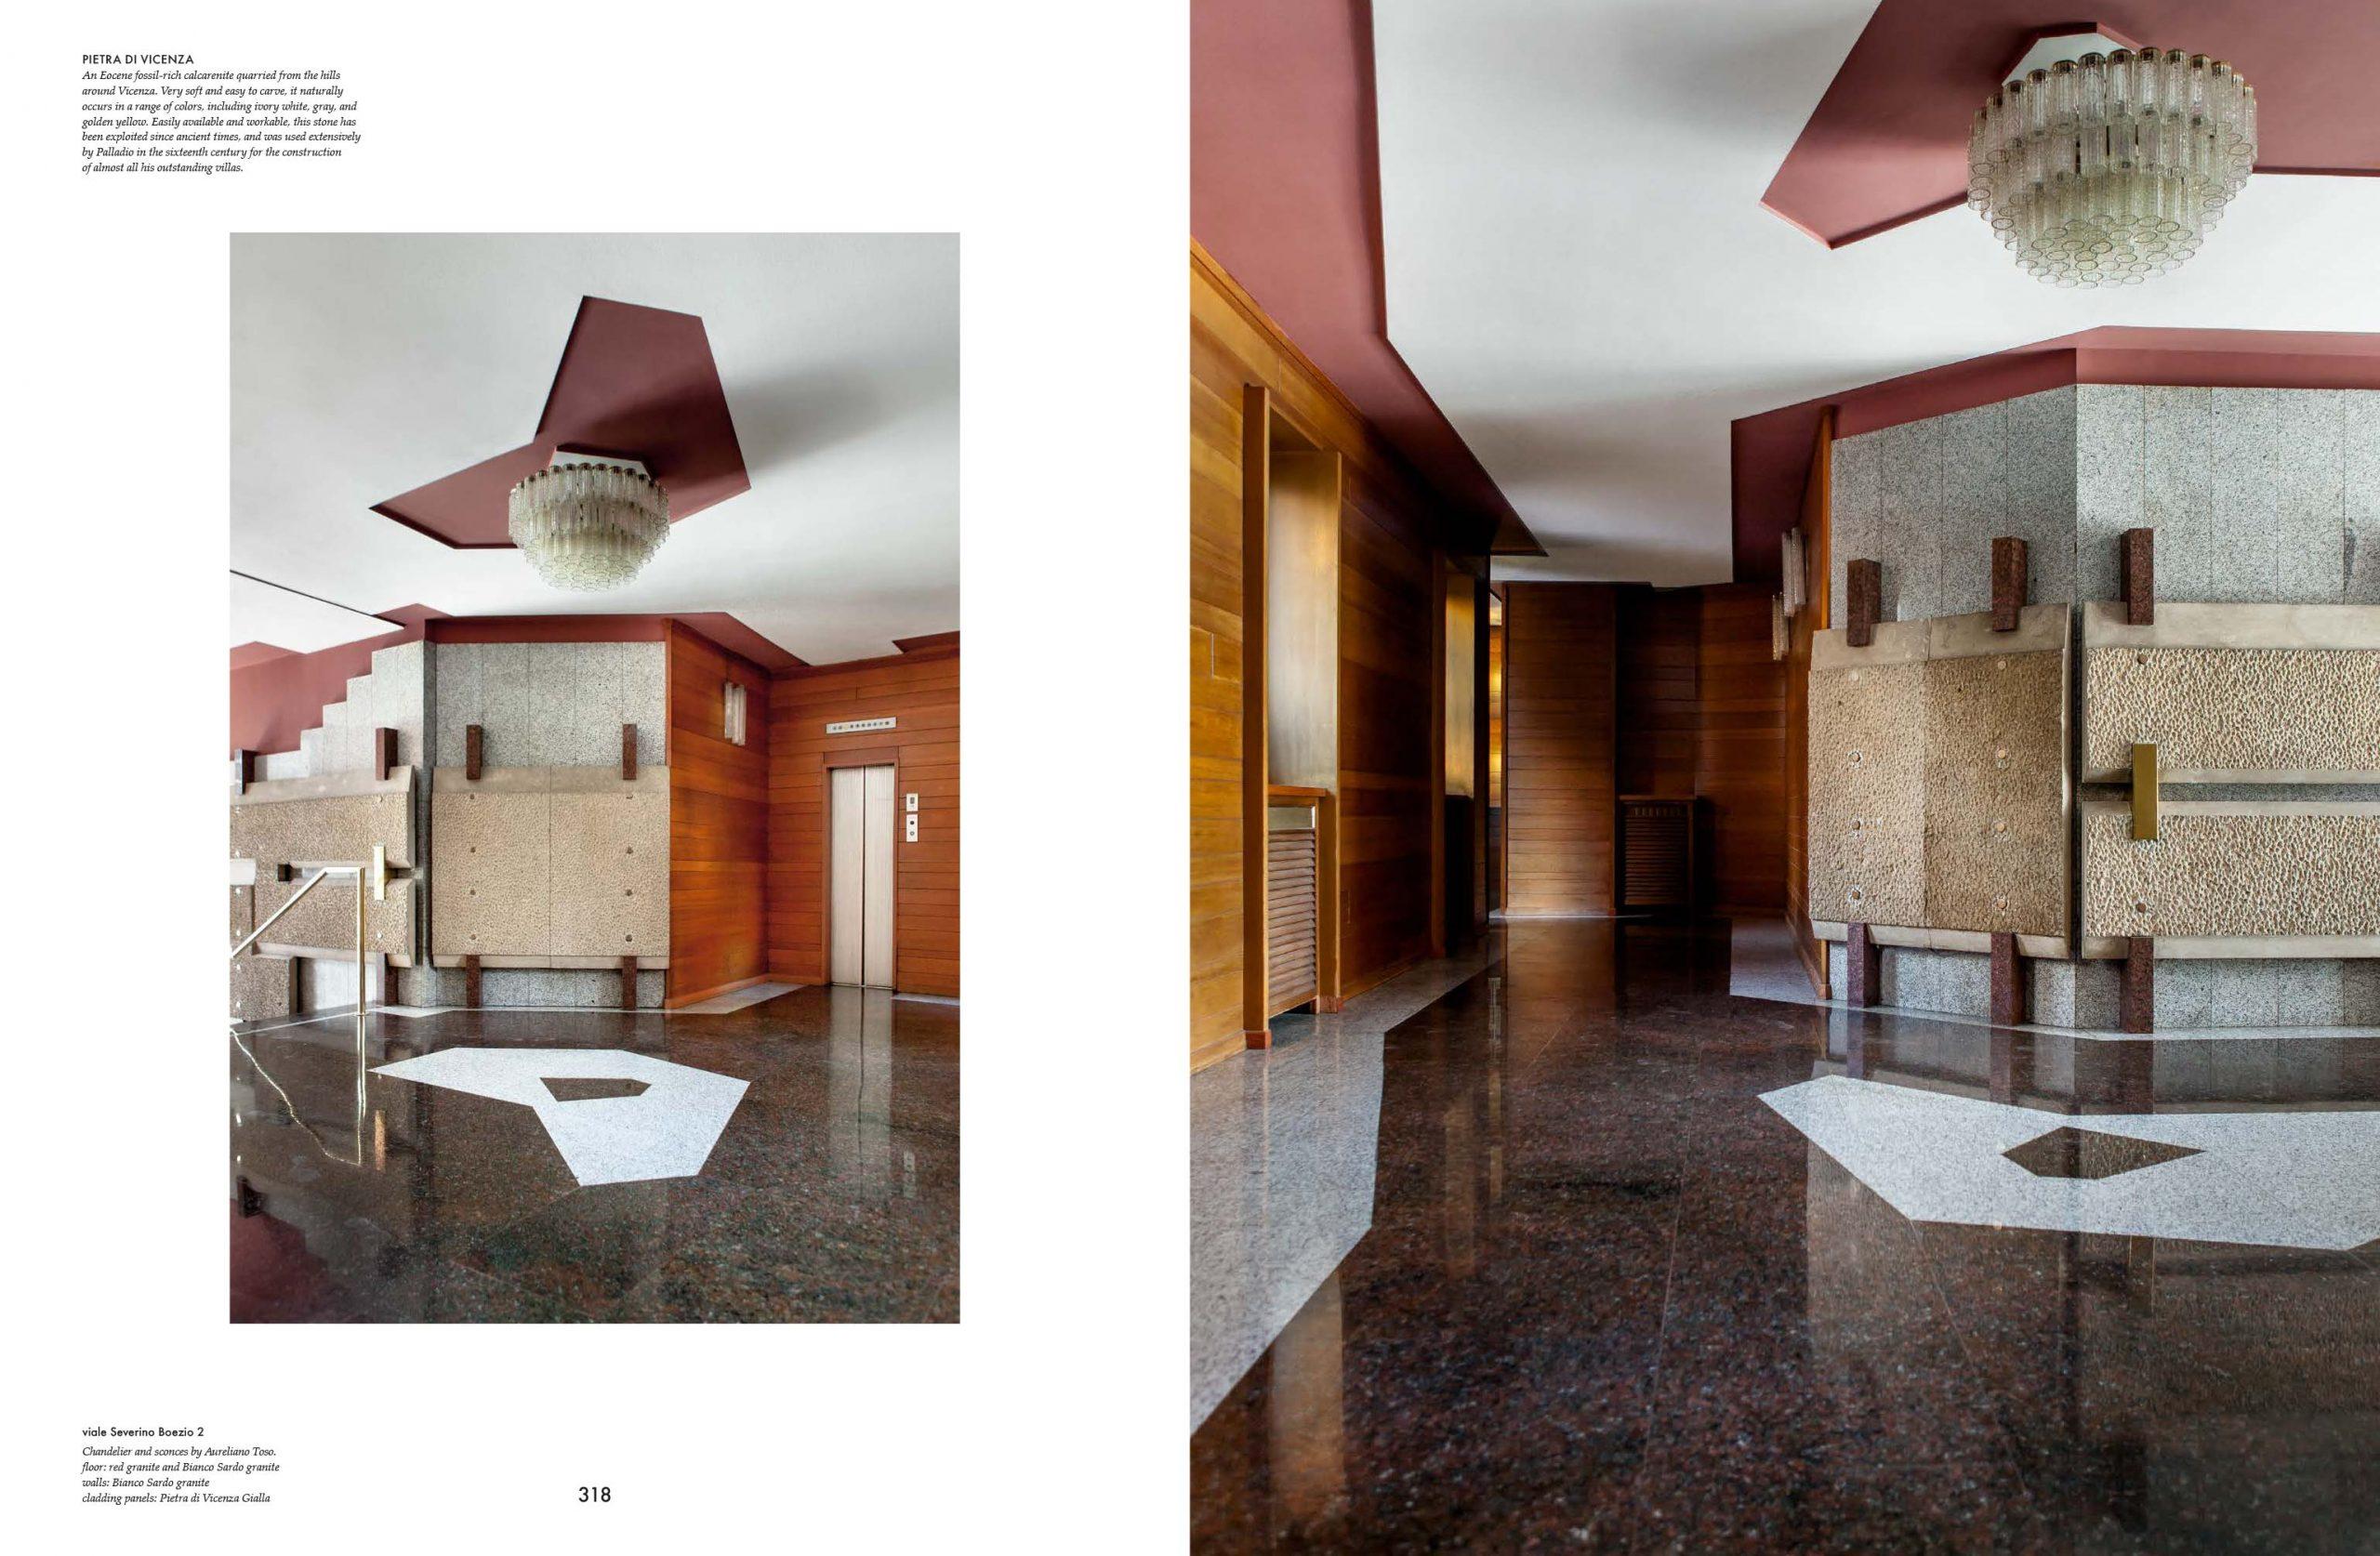 nicoletta-dalfino-karl-kolbitz-entryways-of-milan-taschen-pp318-319-scaled